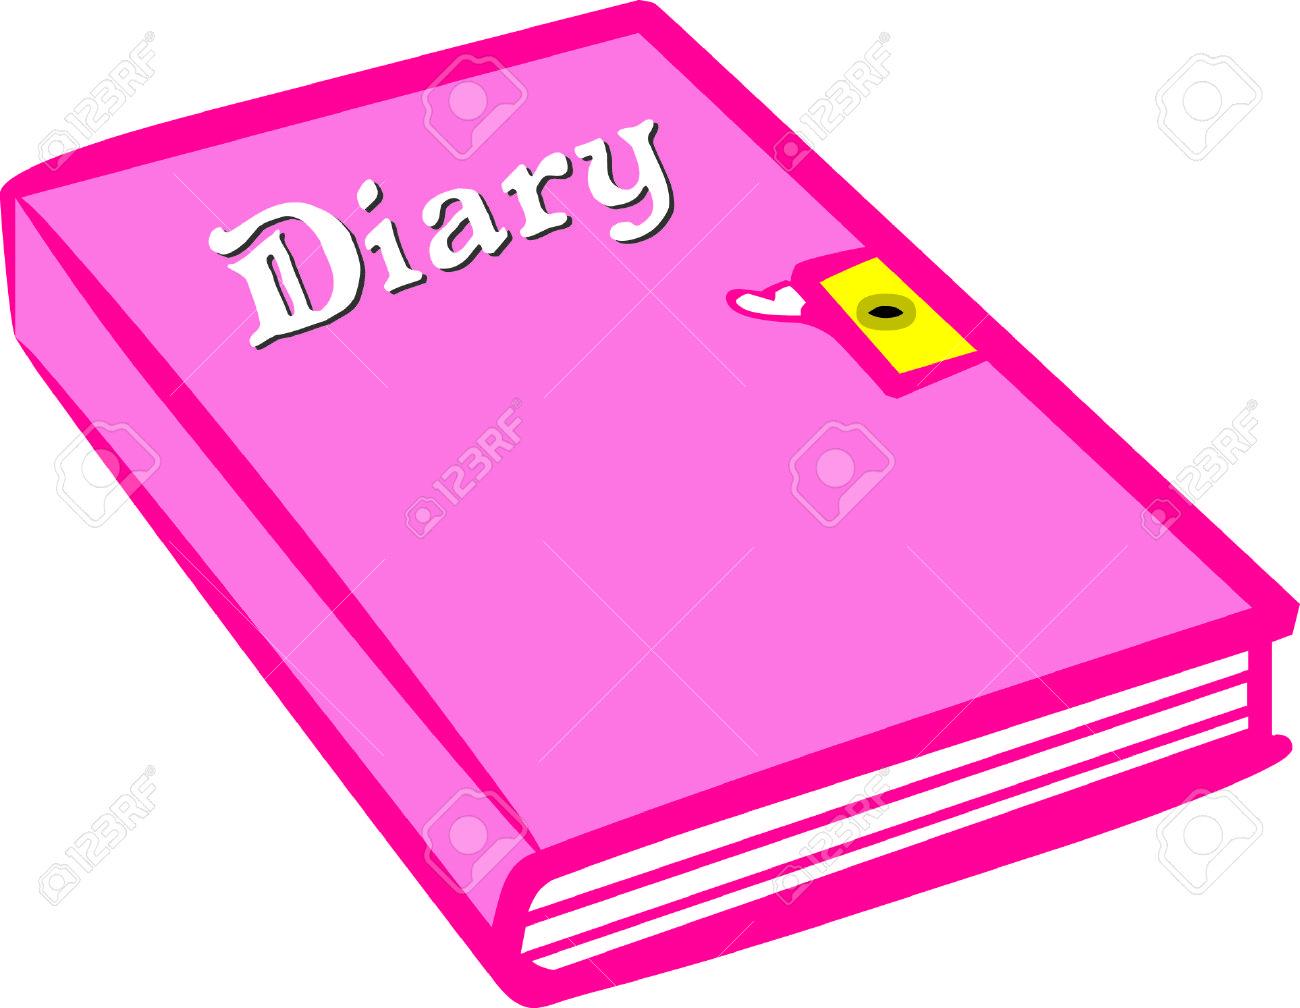 Write Down Those Fun Memories In A Pretty Pink Diary Under Lock.